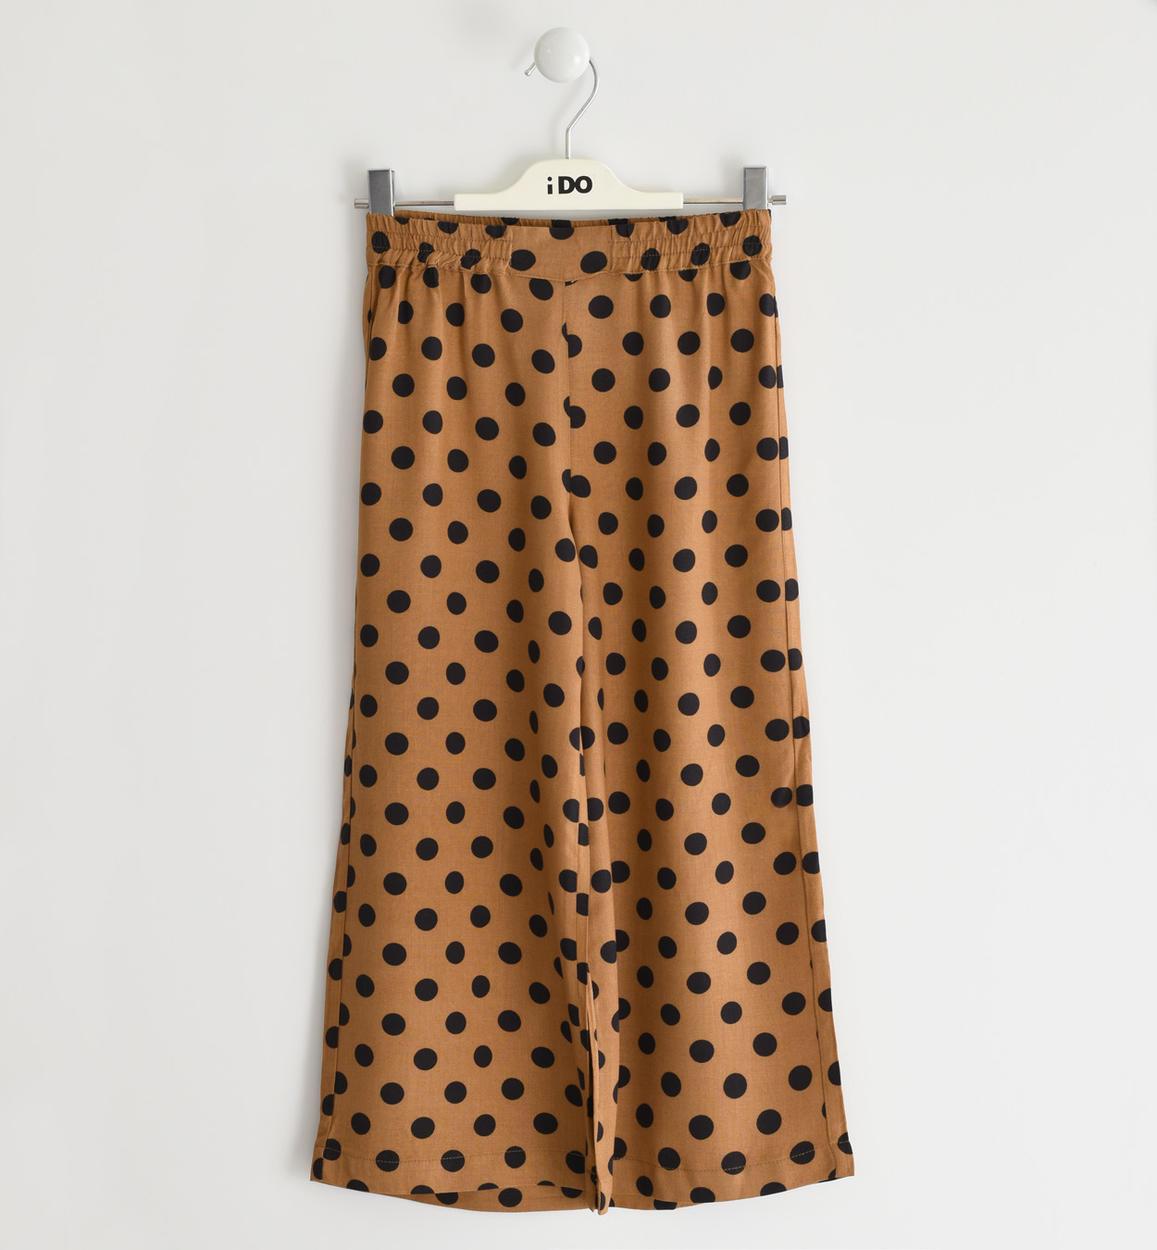 pantalone a palazzo con pois per bambina marrone retro 02 2564j52300 6ml5